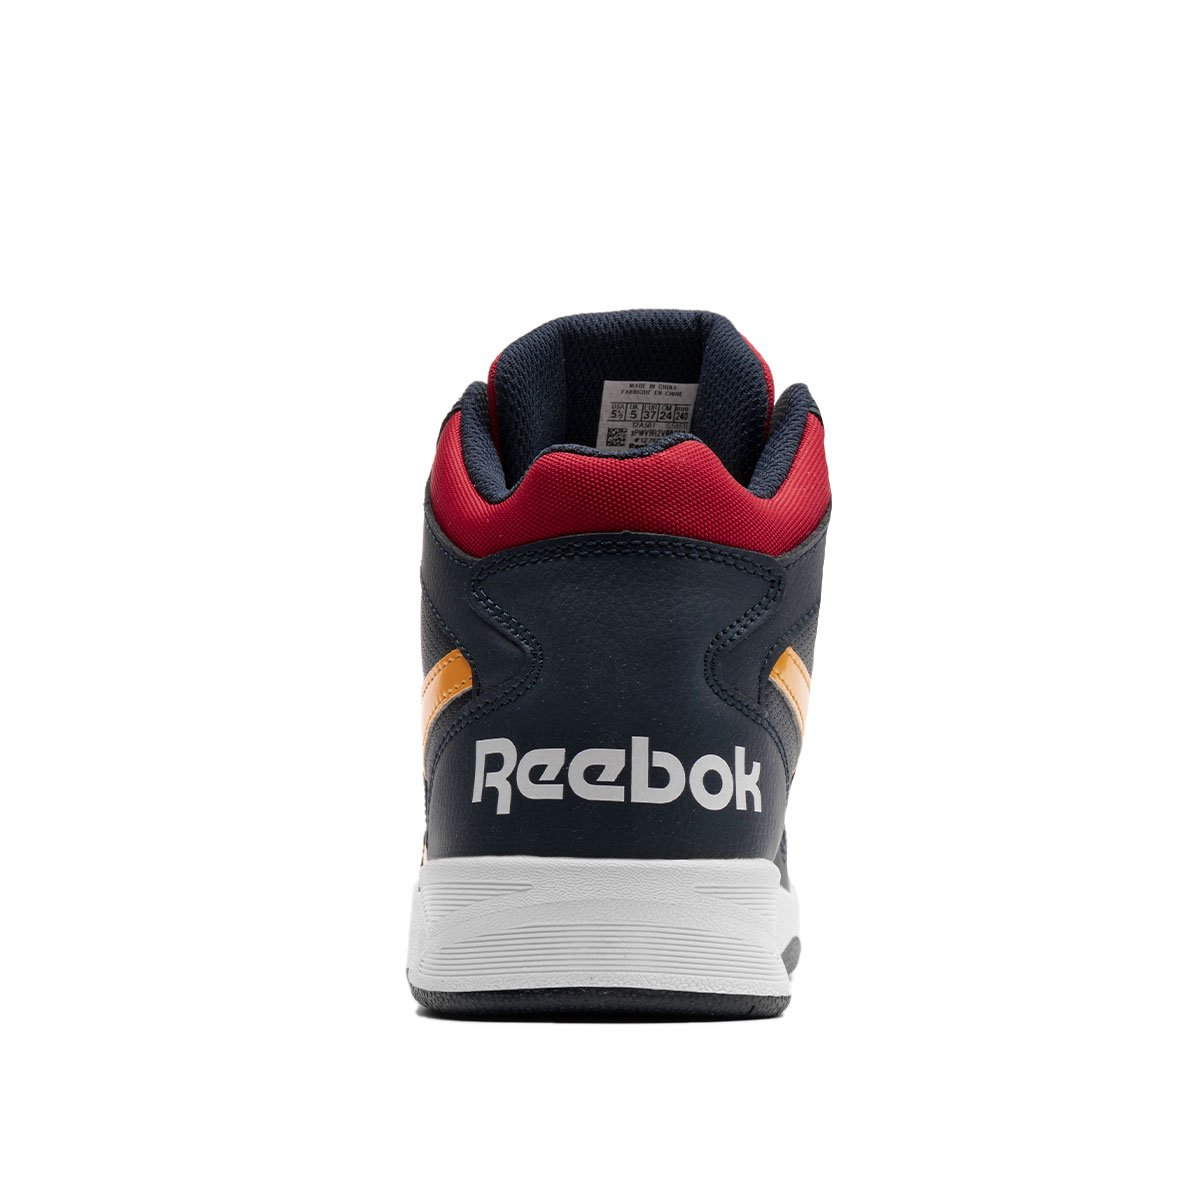 Reebok BB4500 Court